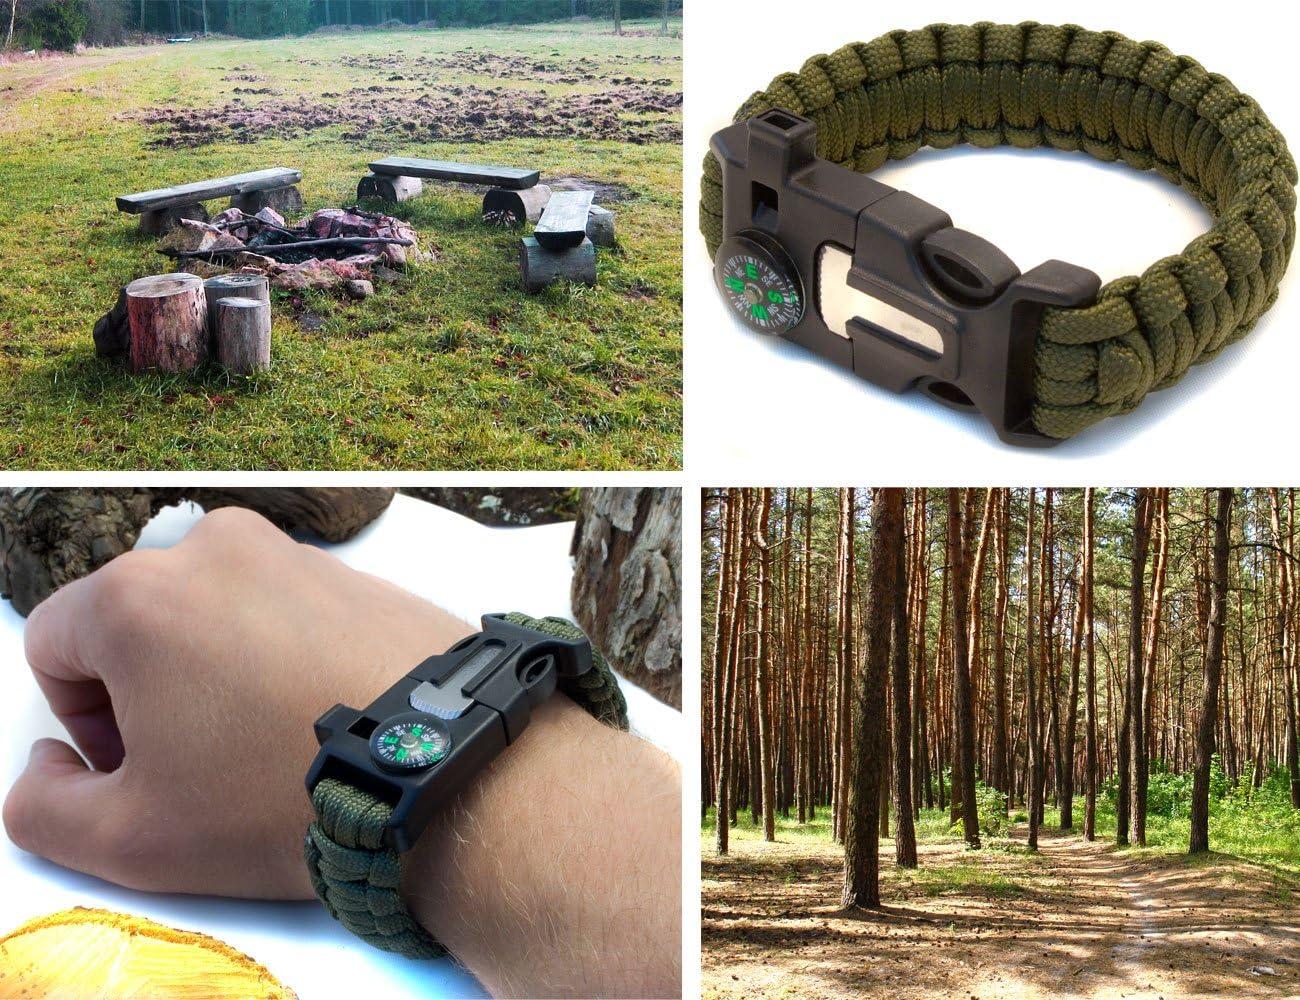 Pfeife Messer 4-in-1 Outdoor Survival Multi-Tool Paracord /Überlebens Armband olivgr/ün Schaber Kompass Outdoor Saxx/®